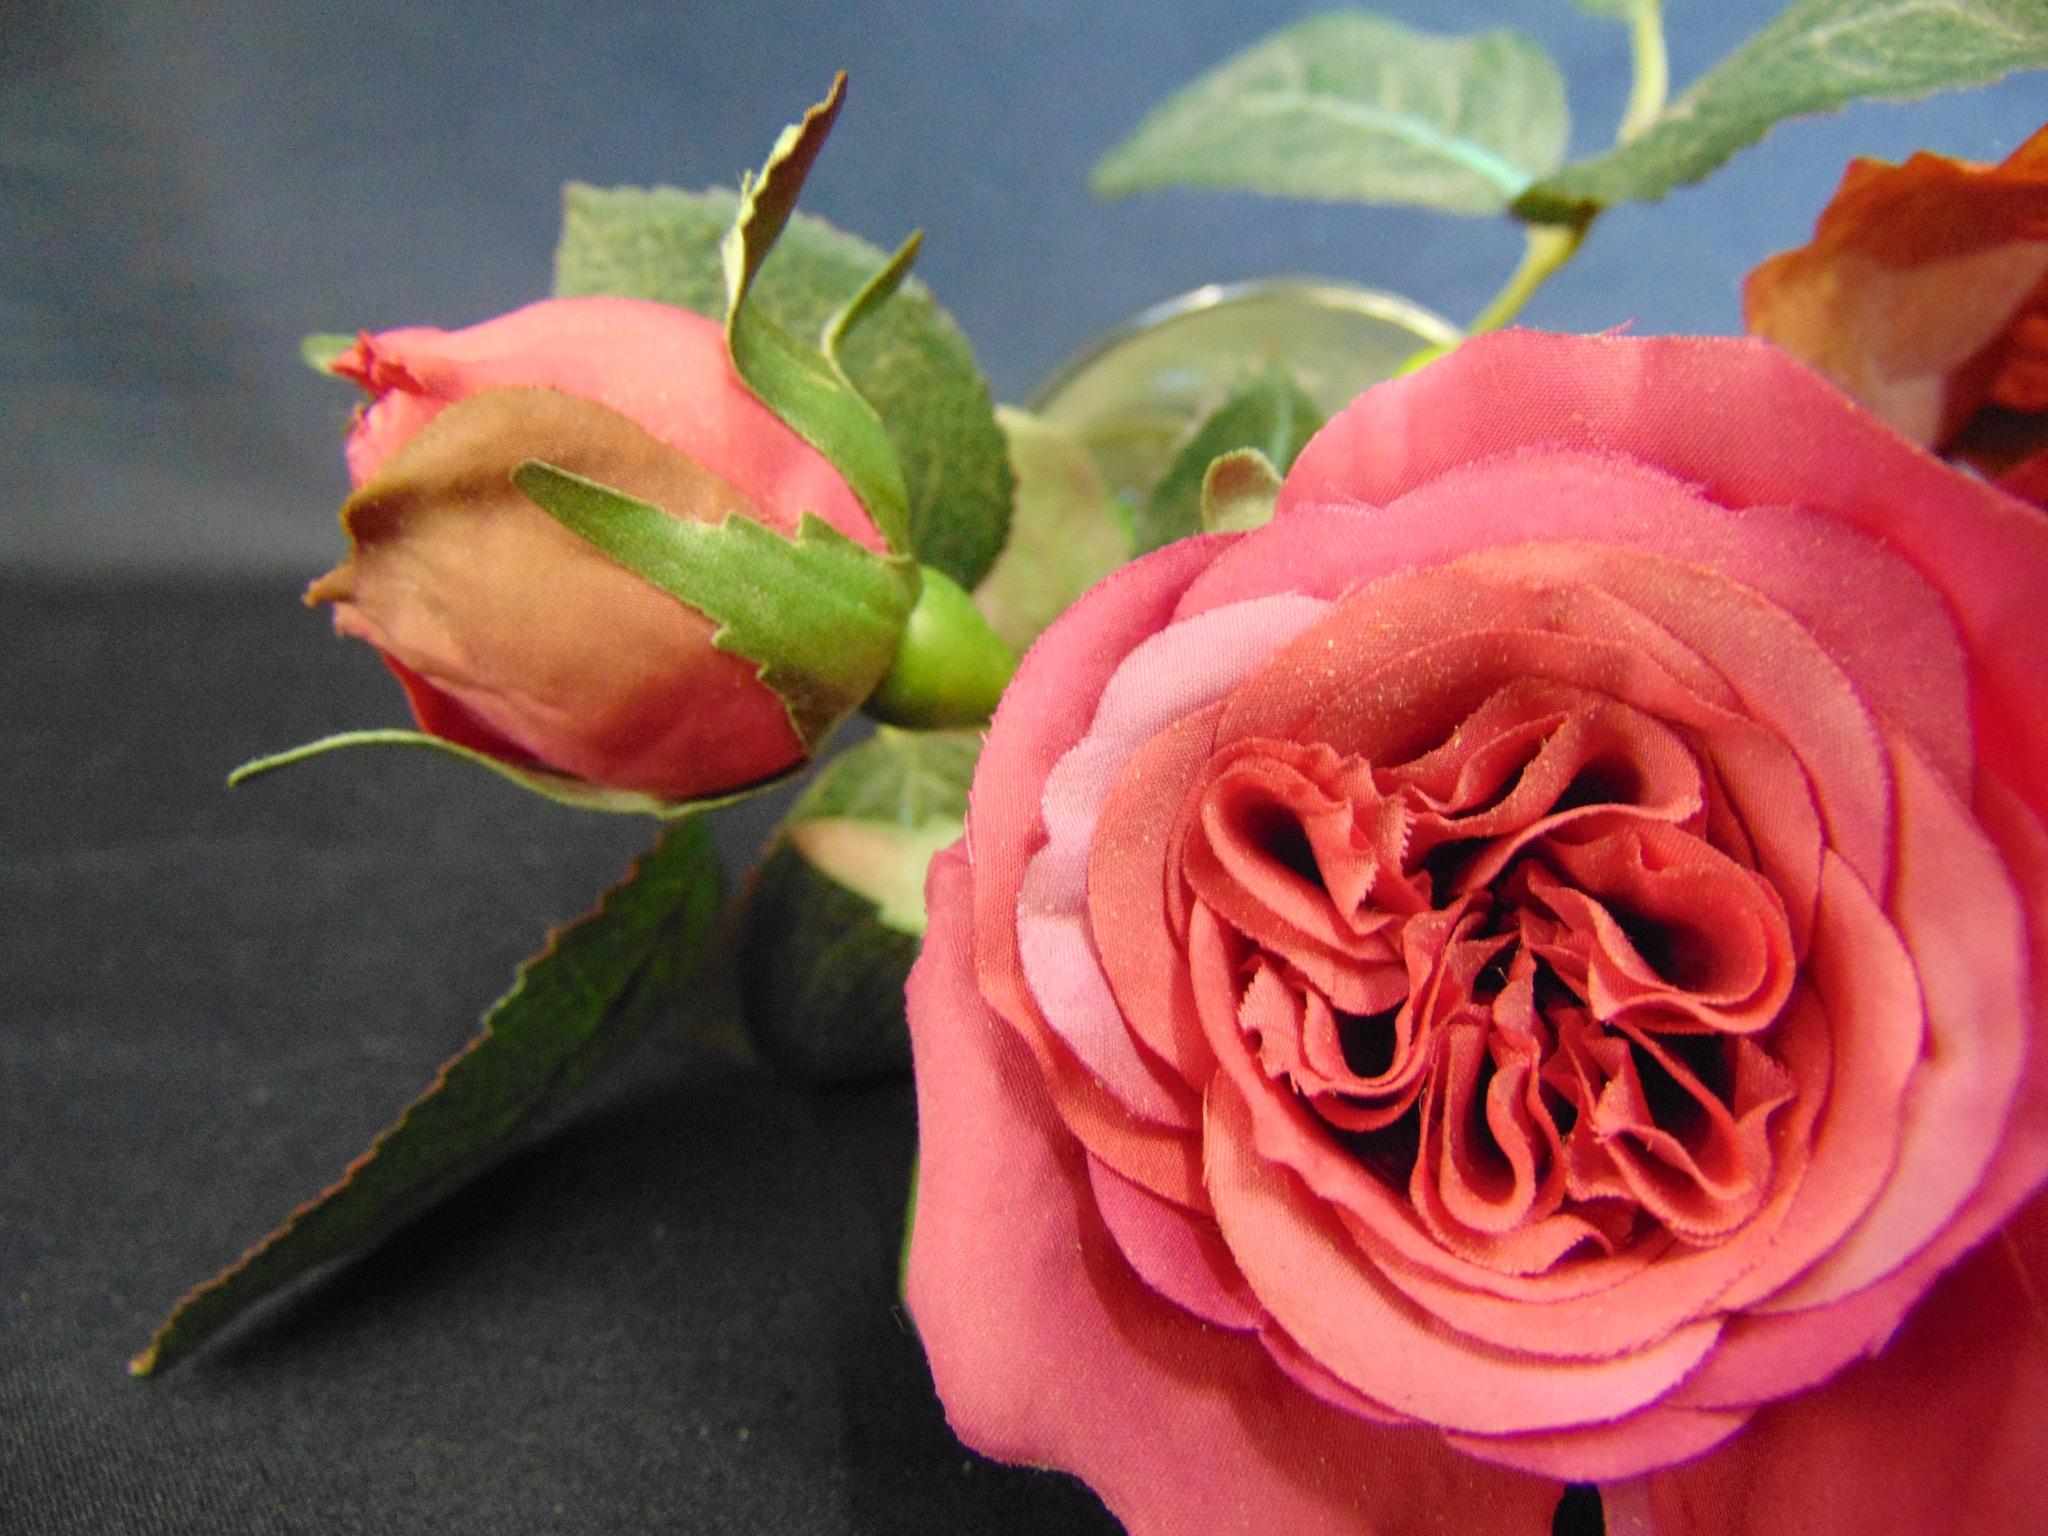 Pink Roses up Close by brian.f.kirkham